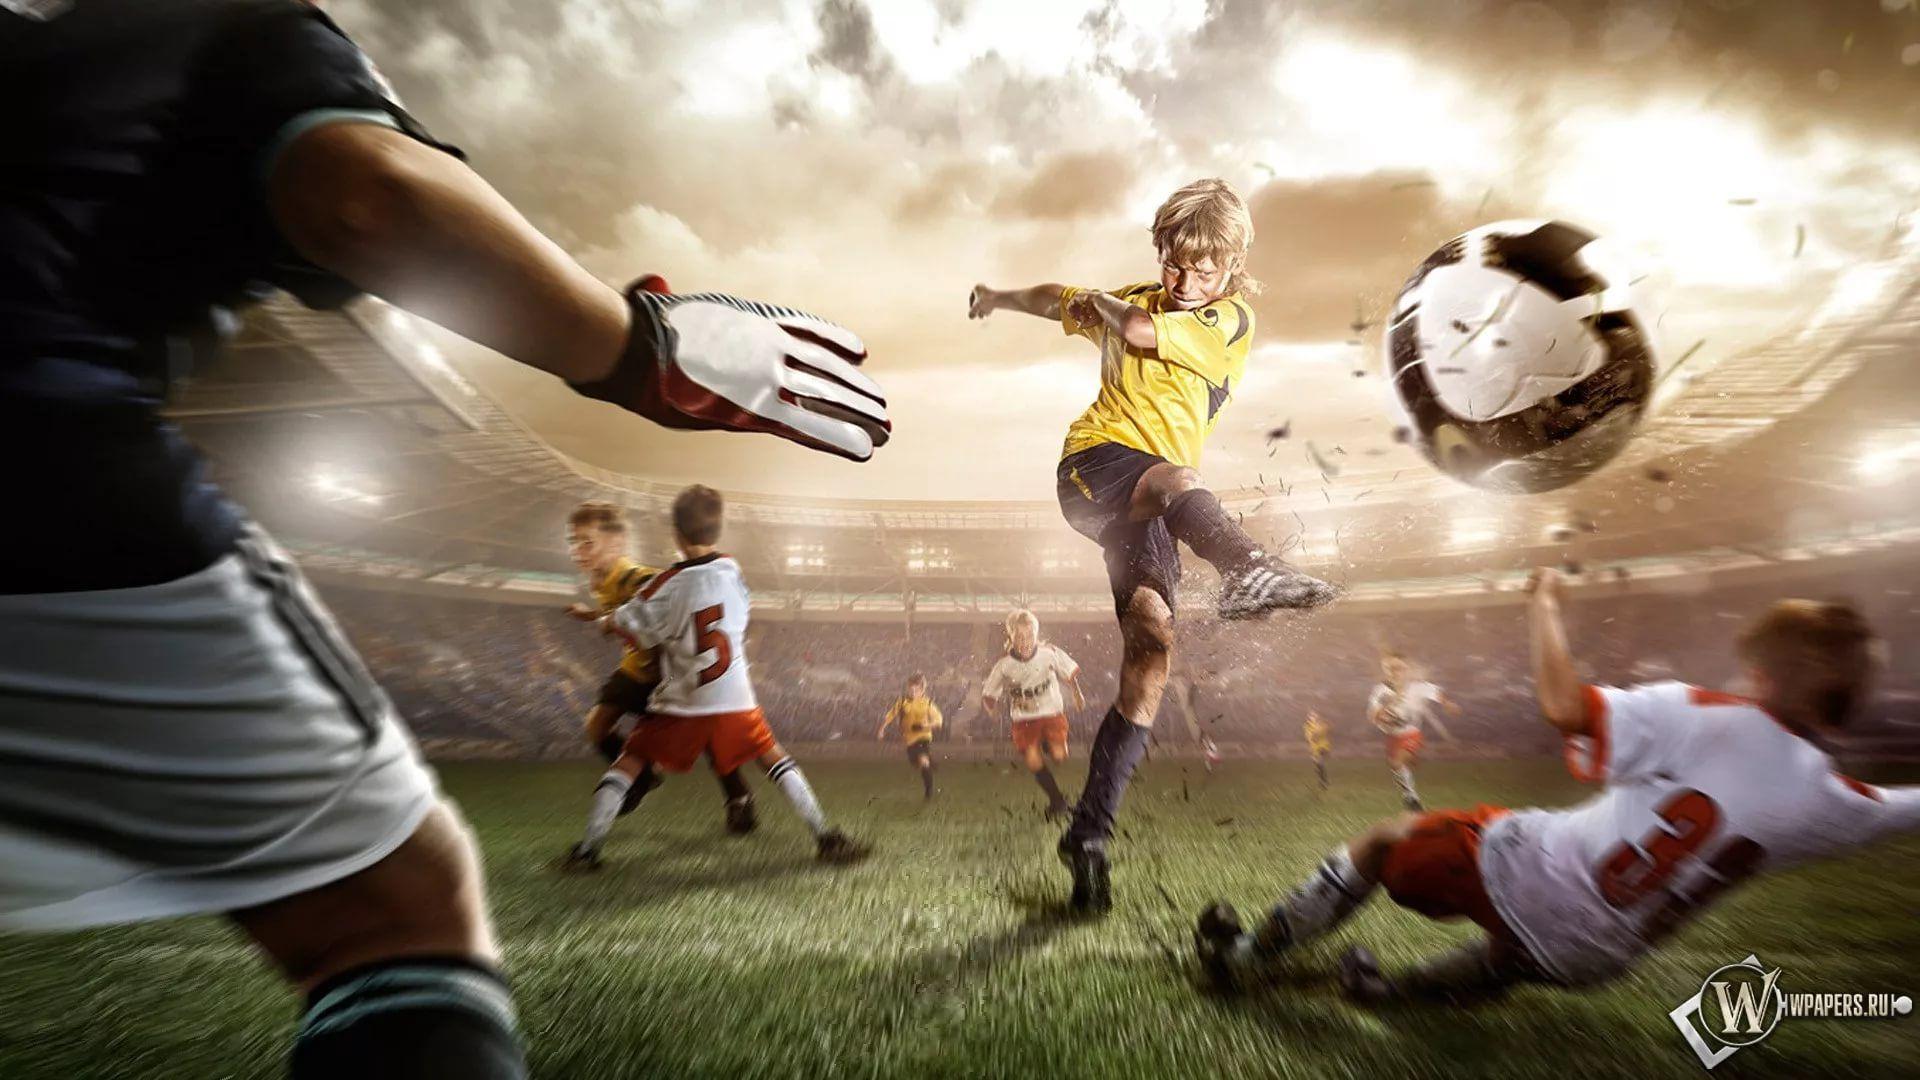 Soccer Player Wallpaper